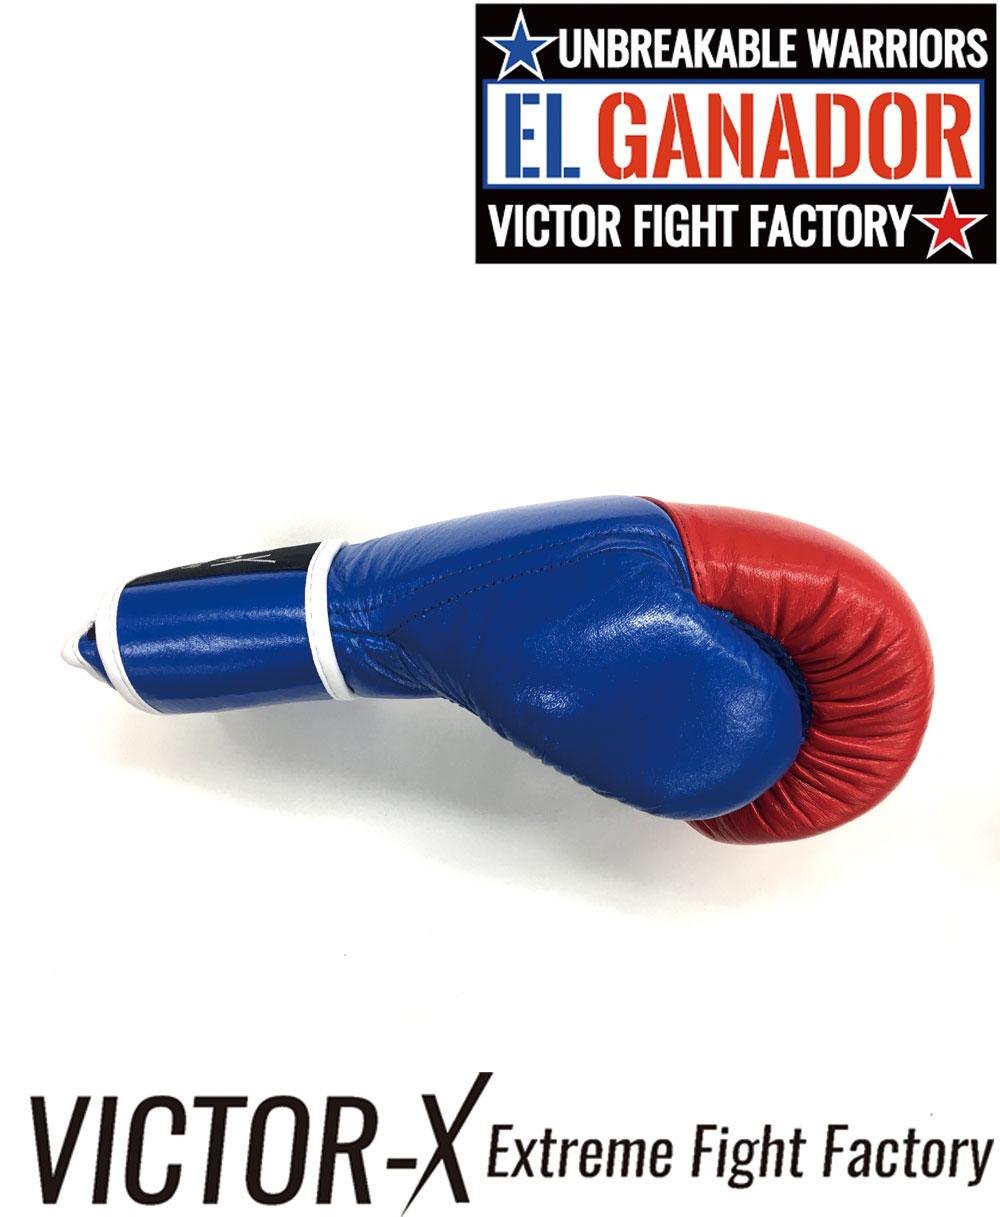 EL GANADOR PANAMA BOXING GLOVE(VICTOR ) ※YouTuberファミリータイムクーポン対象商品 FT愛用モデル